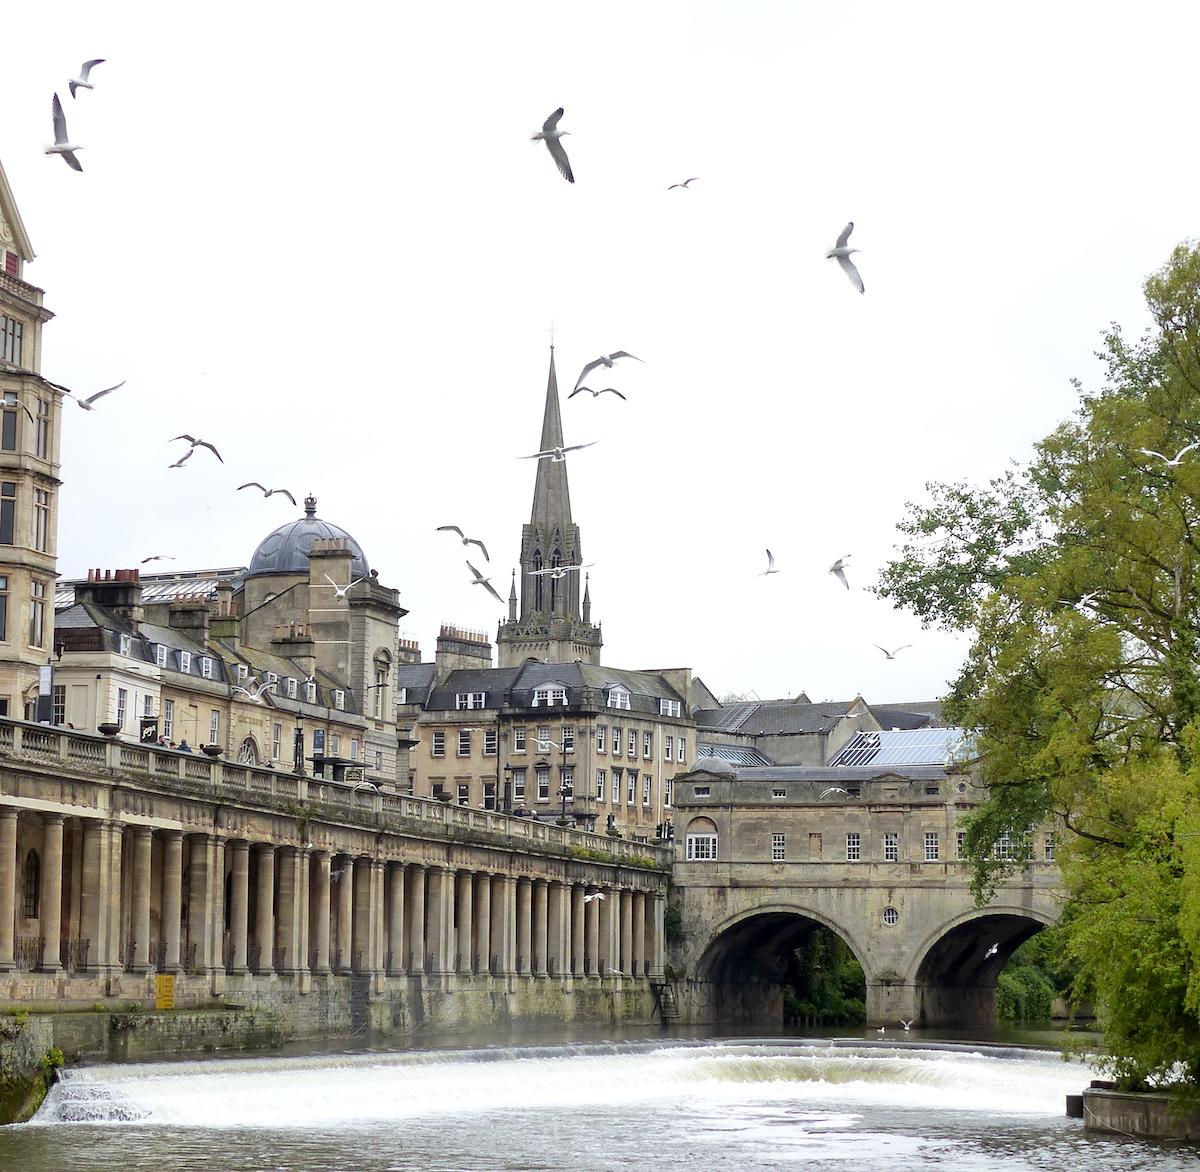 doen in Bath